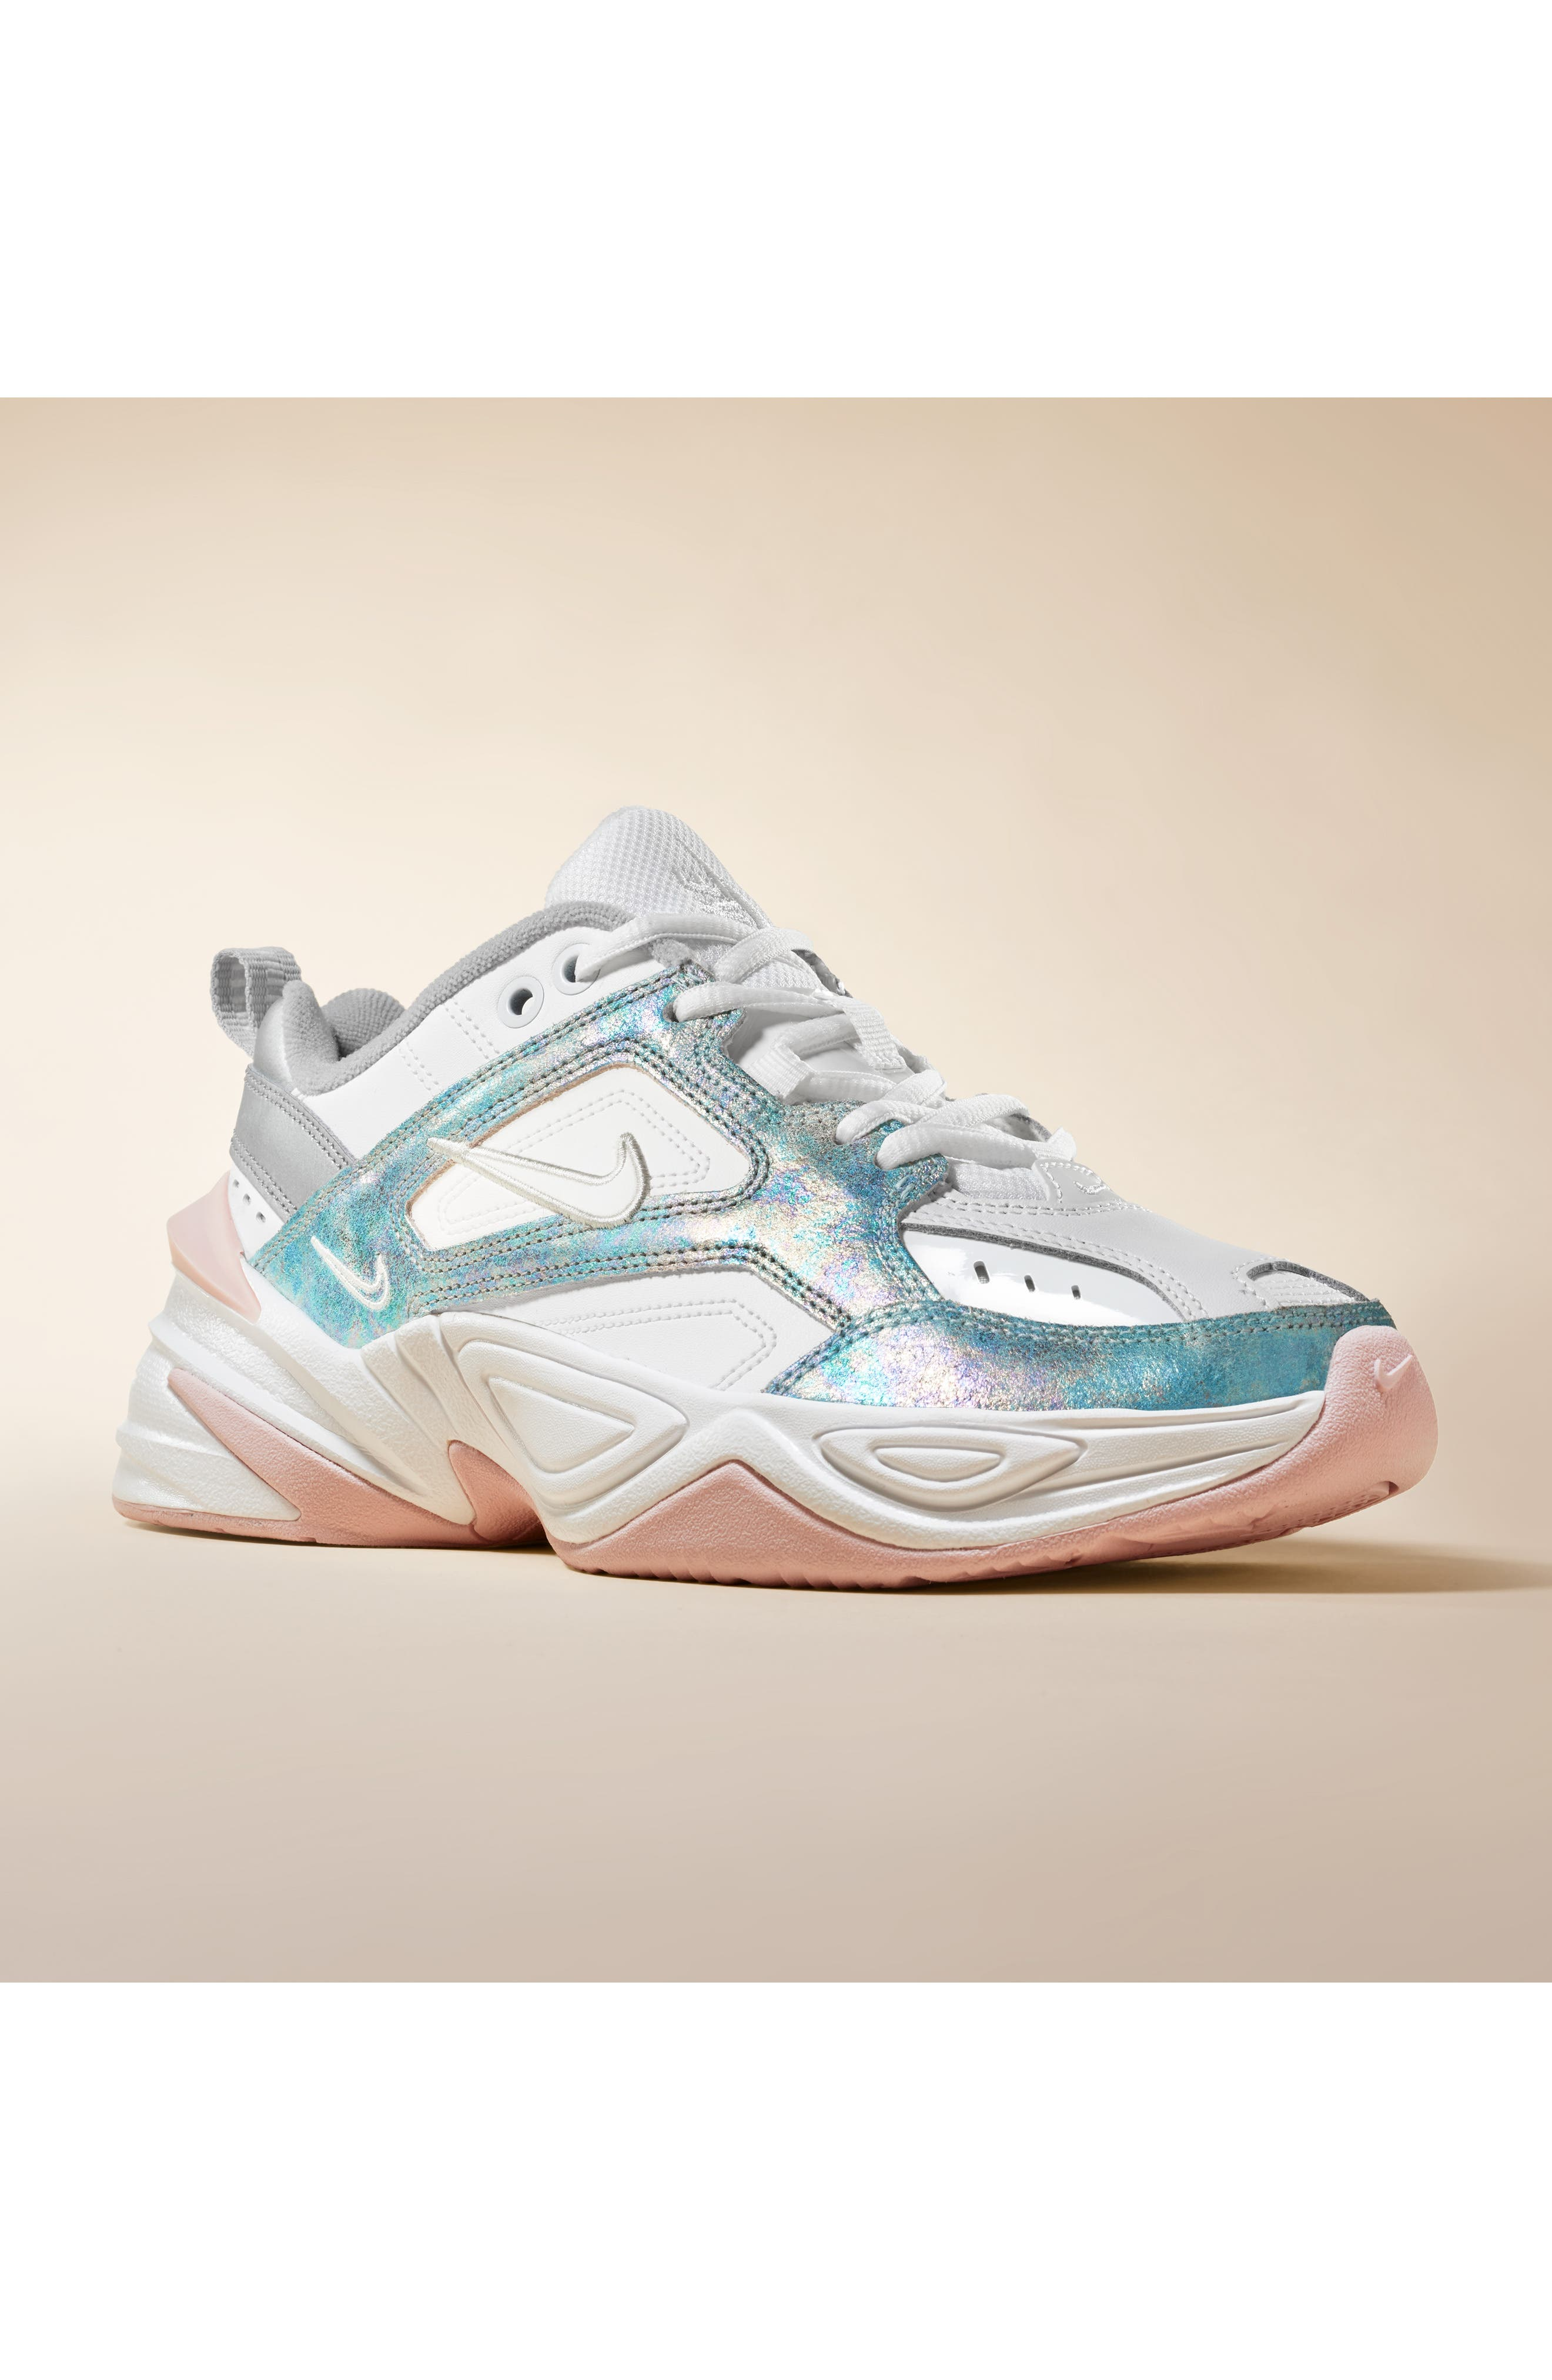 M2K Tekno Sneaker,                             Alternate thumbnail 7, color,                             PLATINUM TINT/ CELERY/ GREY